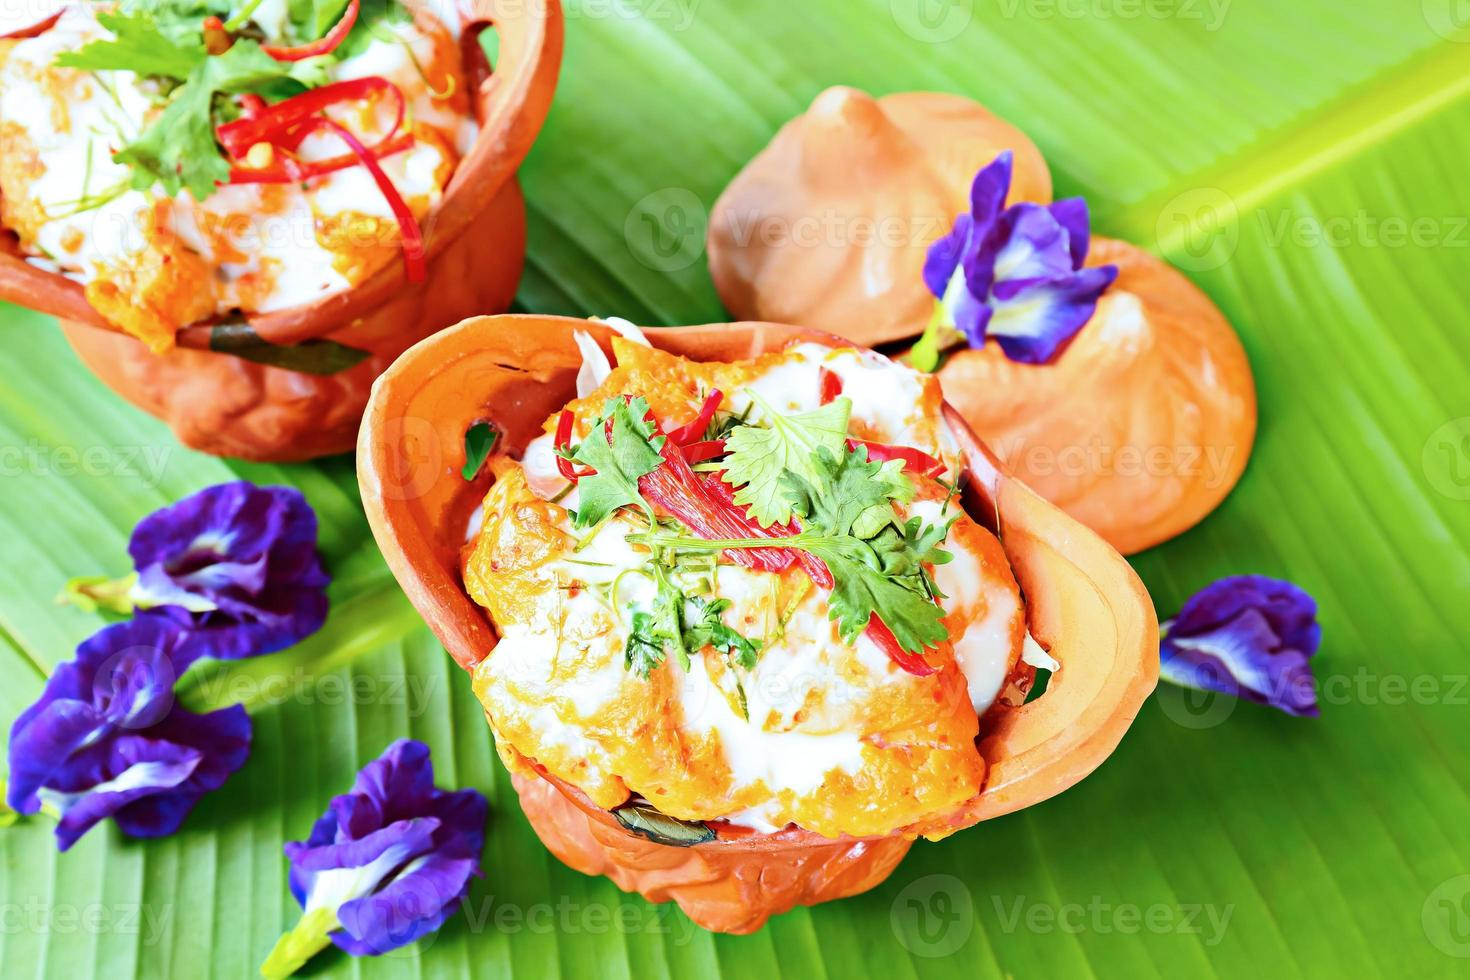 deliciosa comida tailandesa, peixe cozido no vapor com pasta de curry. foto